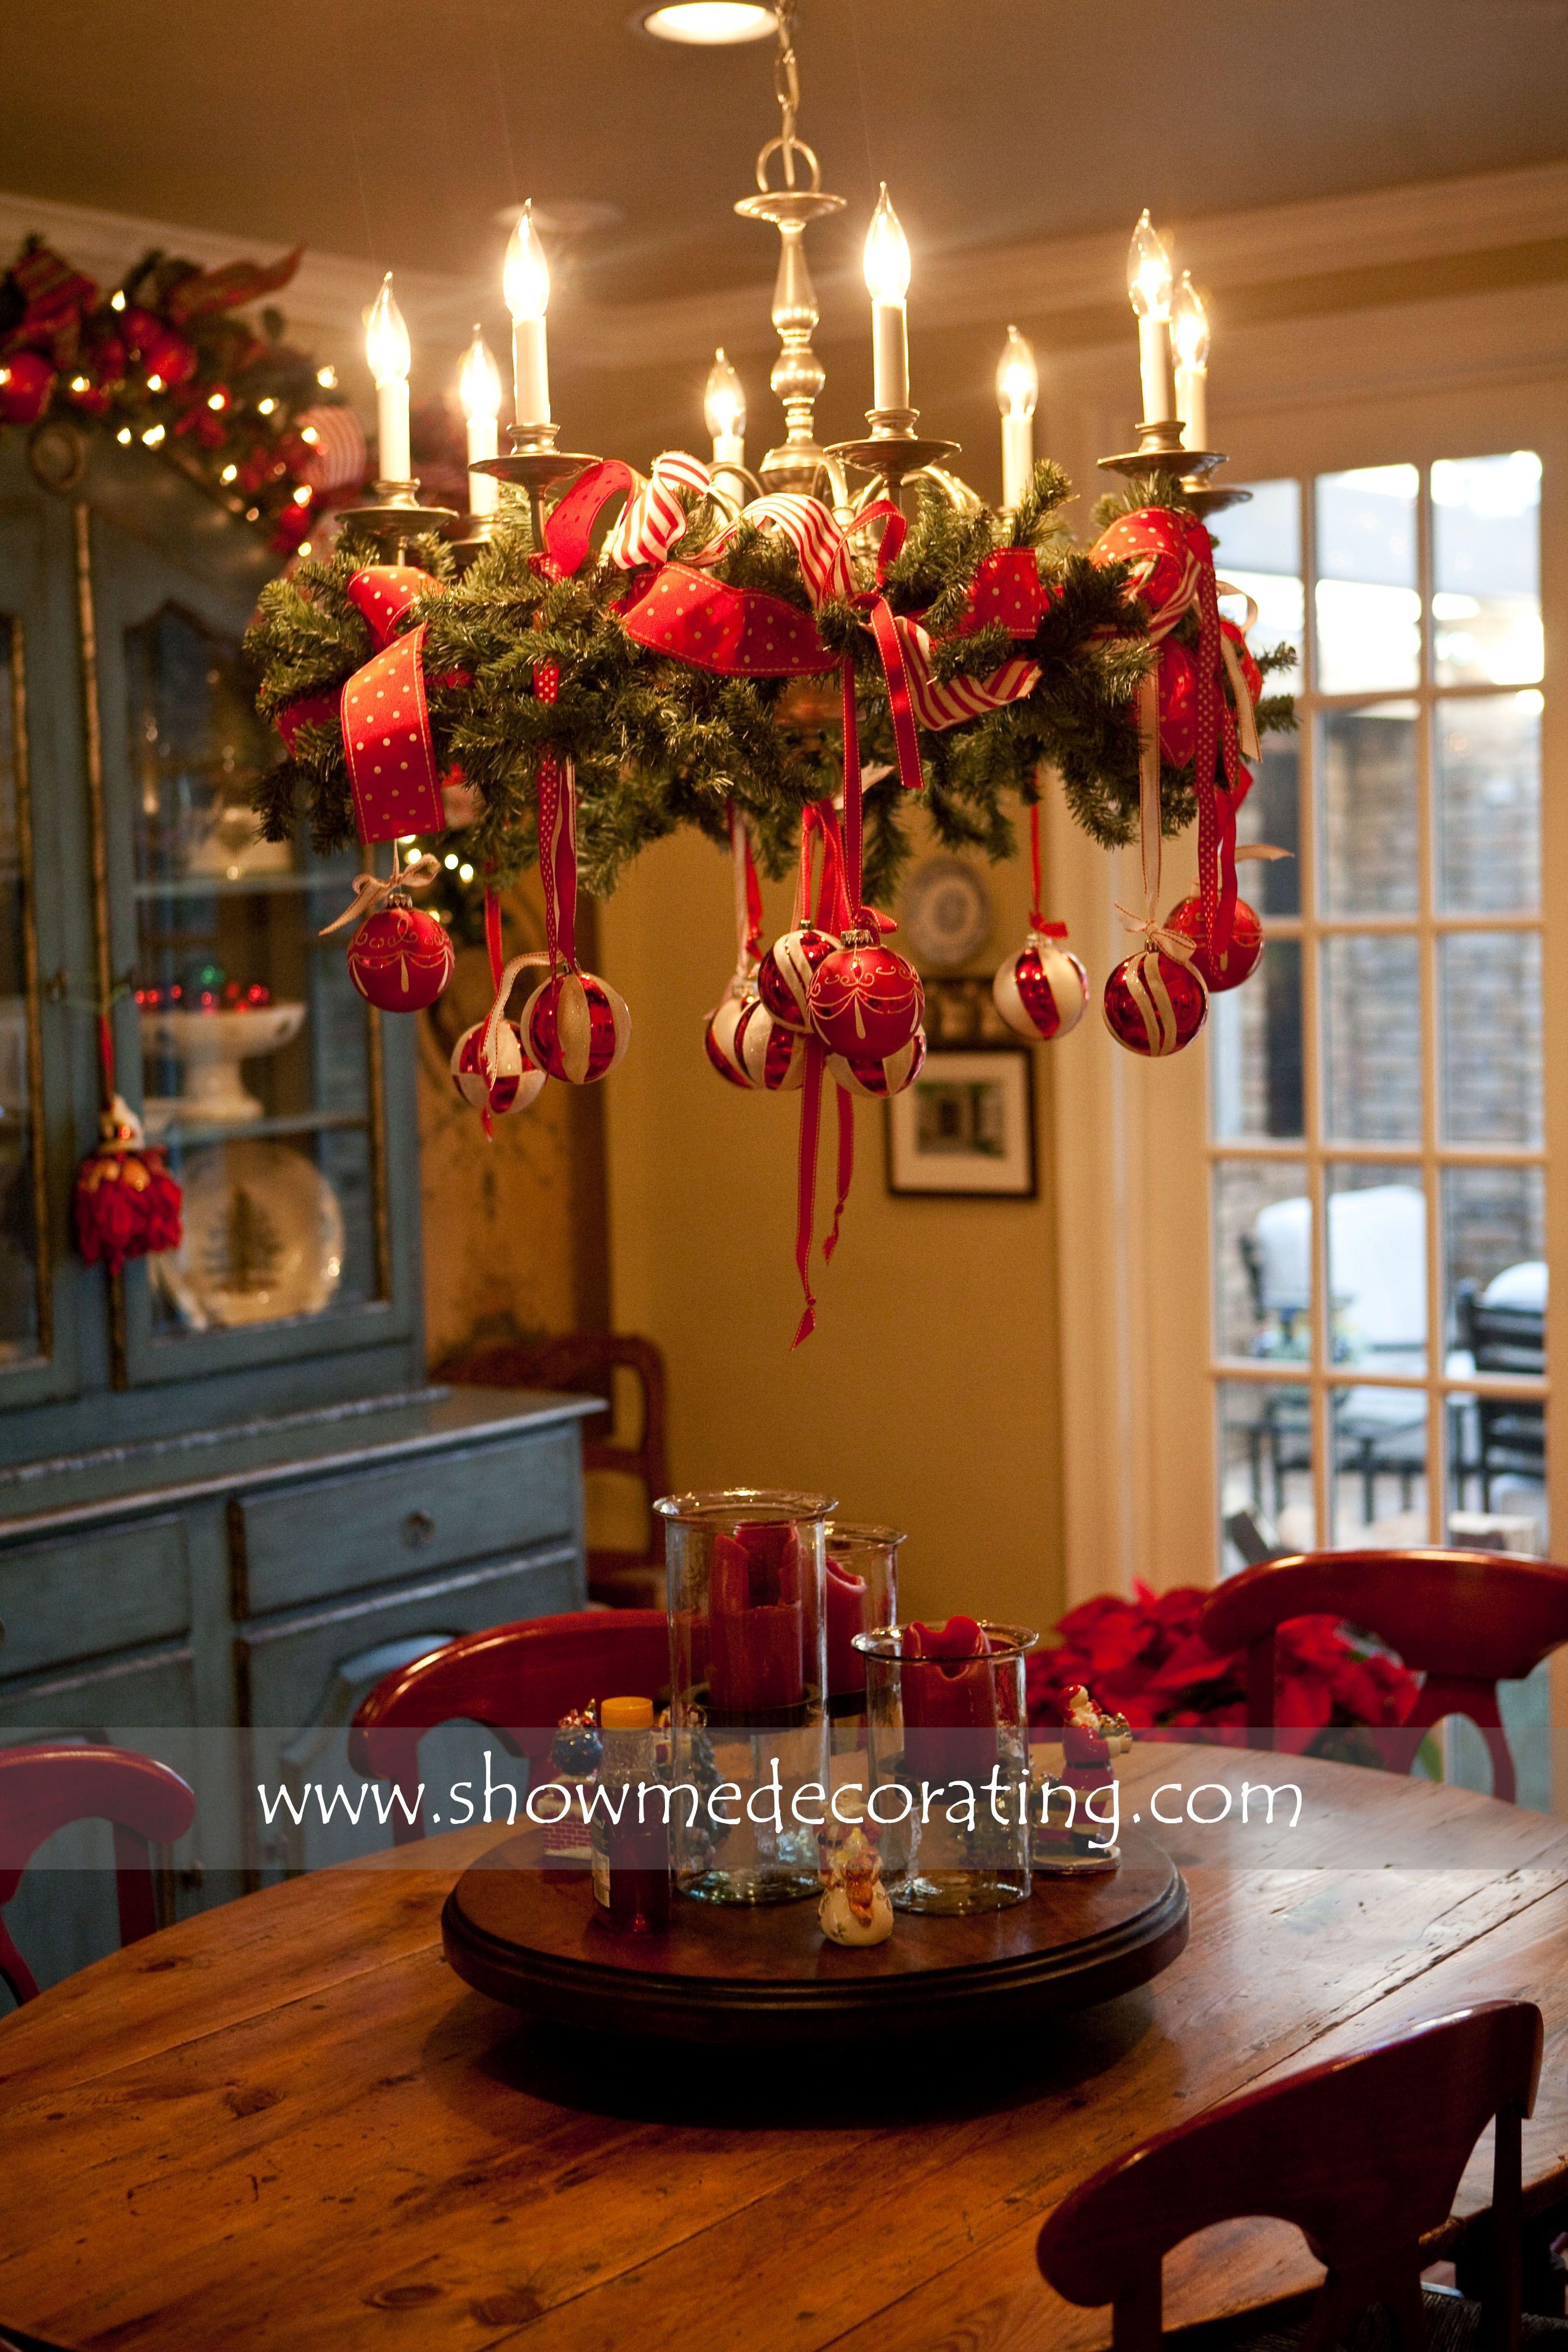 Christmas Decor Christmas Chandelier Christmas Decorations